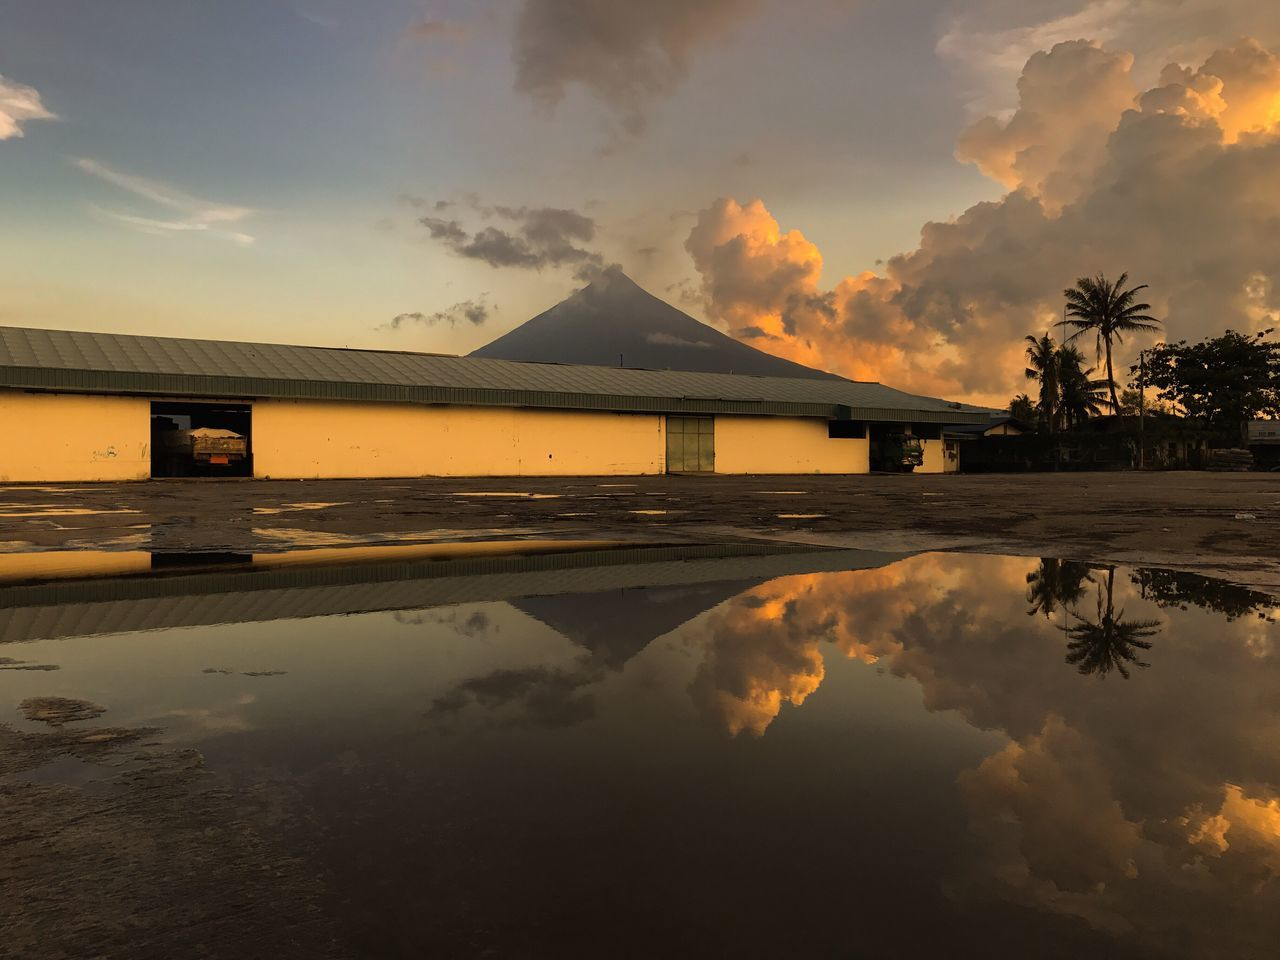 Water Nature Sky EyeEm EyeEm Best Shots EyeEm Gallery Beauty In Nature Scenics Built Structure Mayon Volcano Philippines EyeEmBestPics Reflection